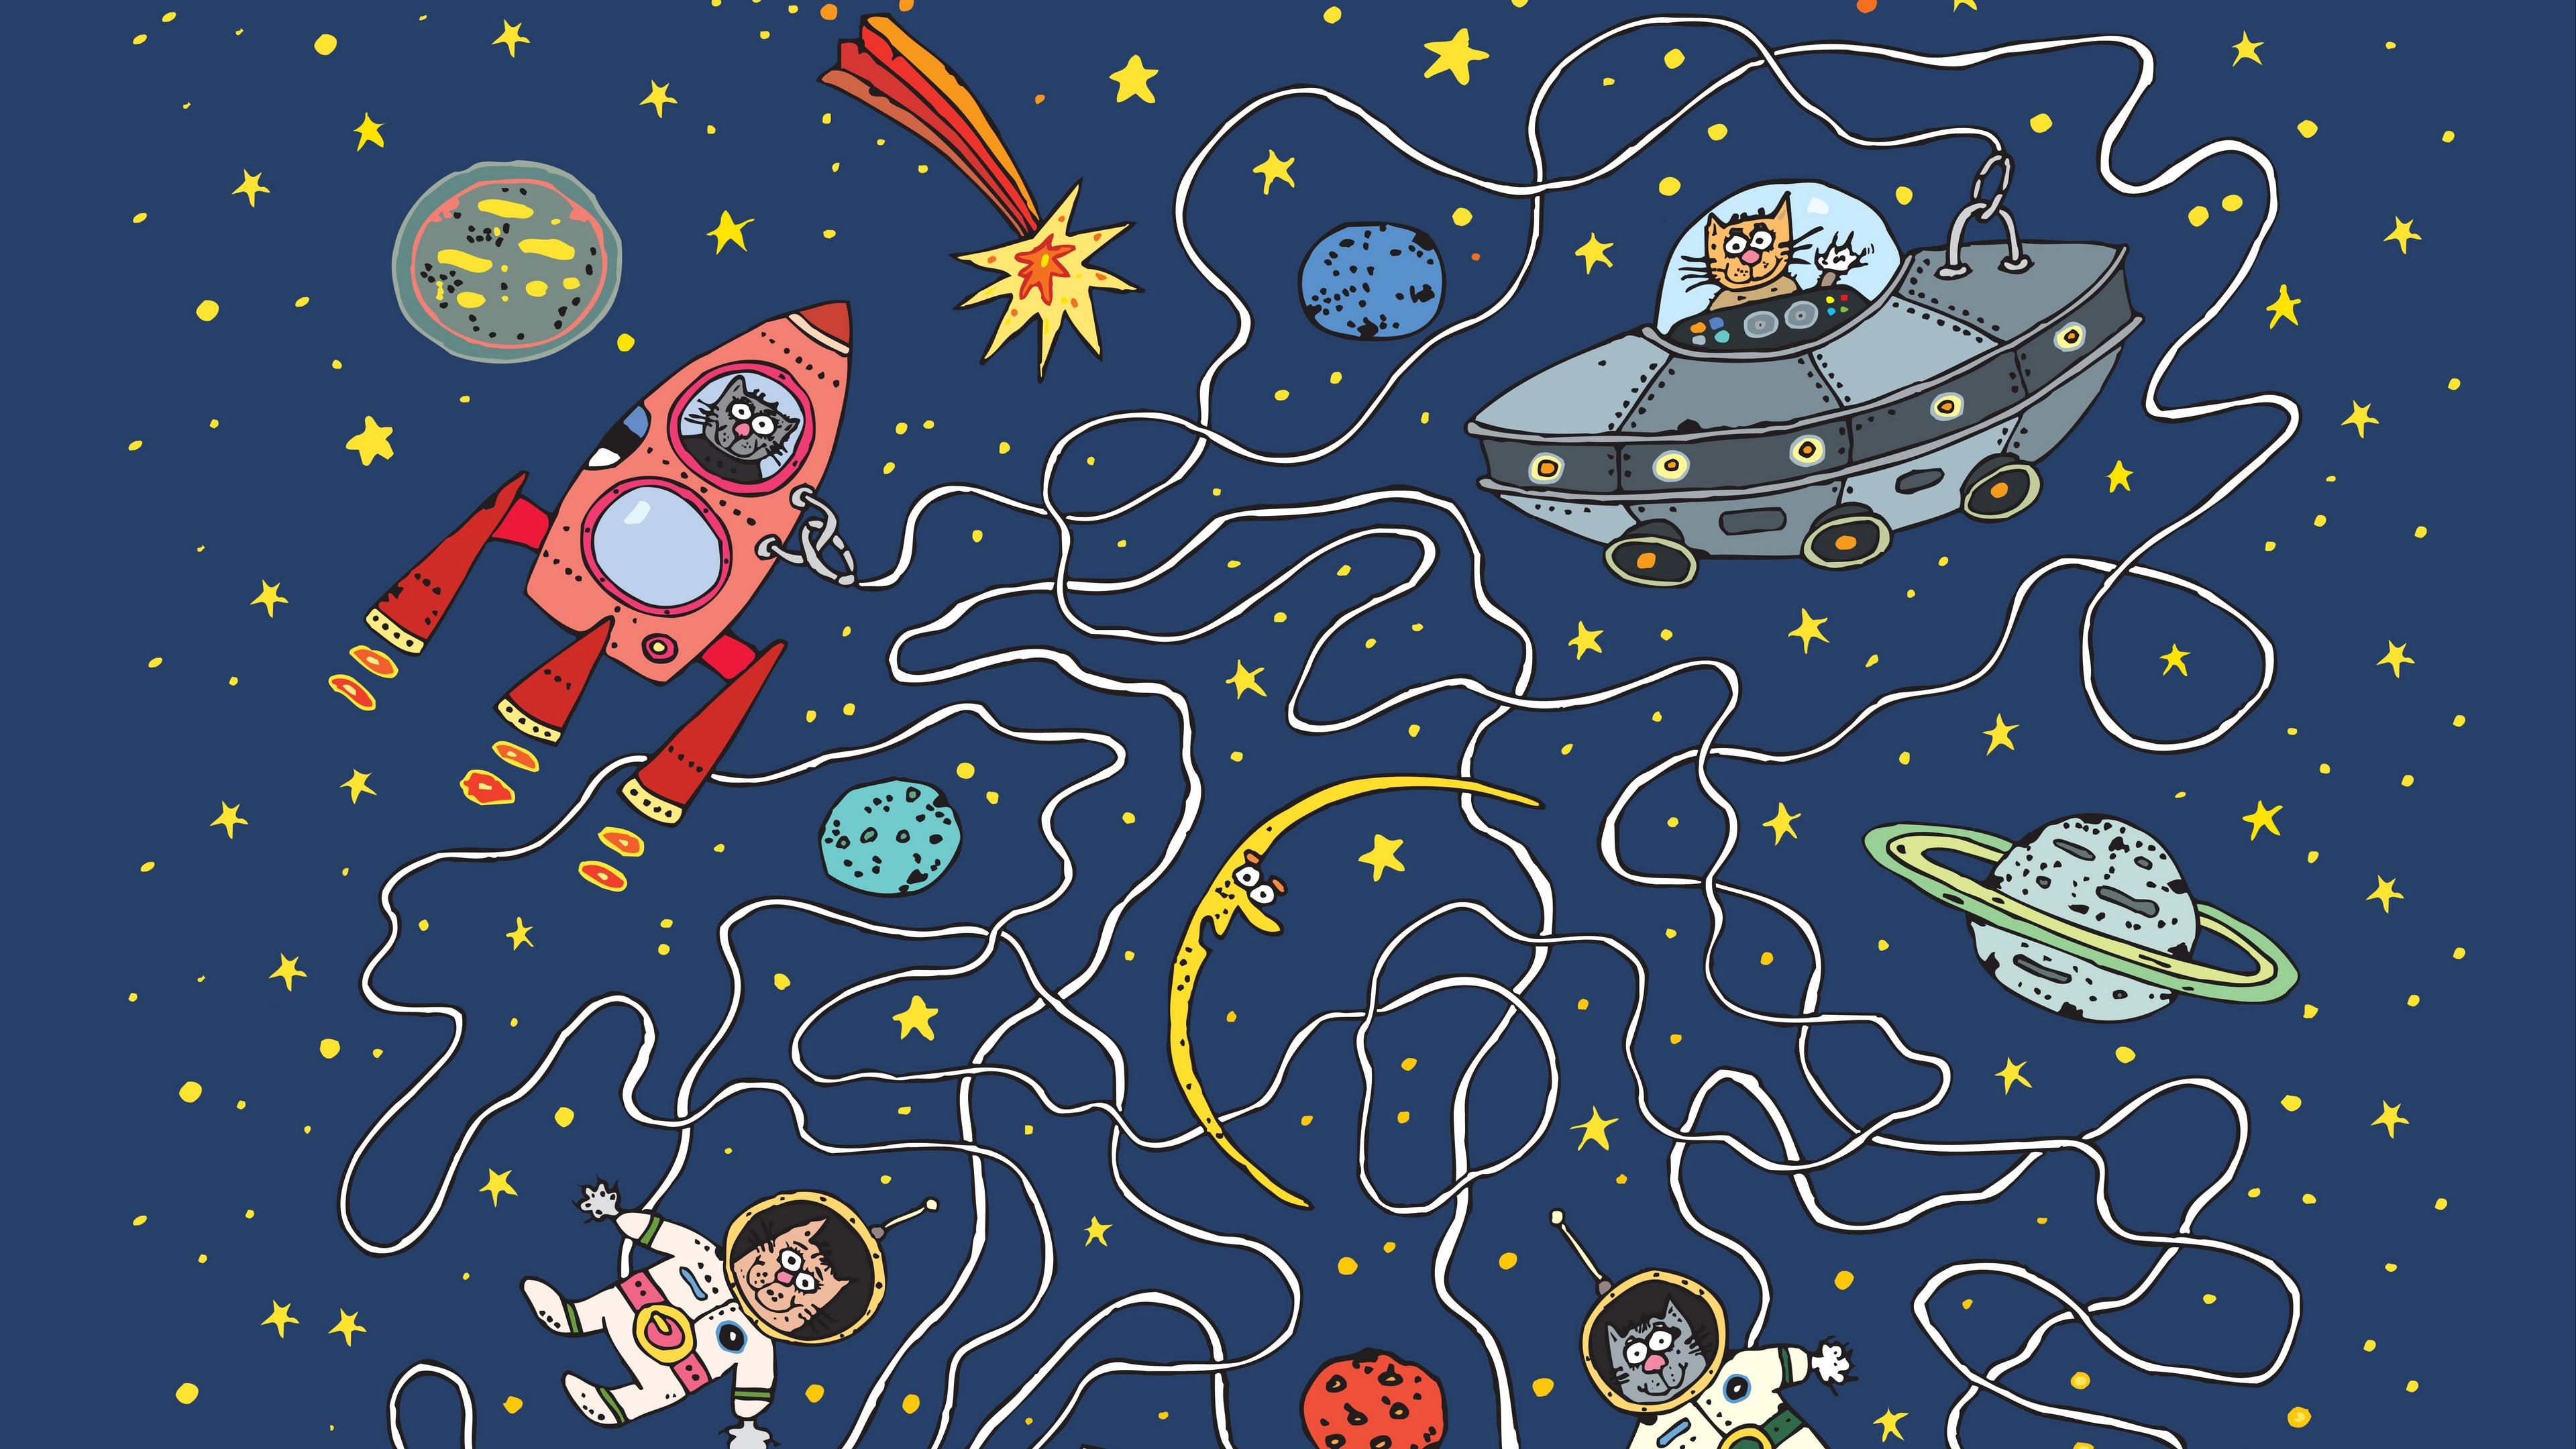 astronauts cats rocket planet art funny 4k 1541971108 - astronauts, cats, rocket, planet, art, funny 4k - Rocket, cats, Astronauts